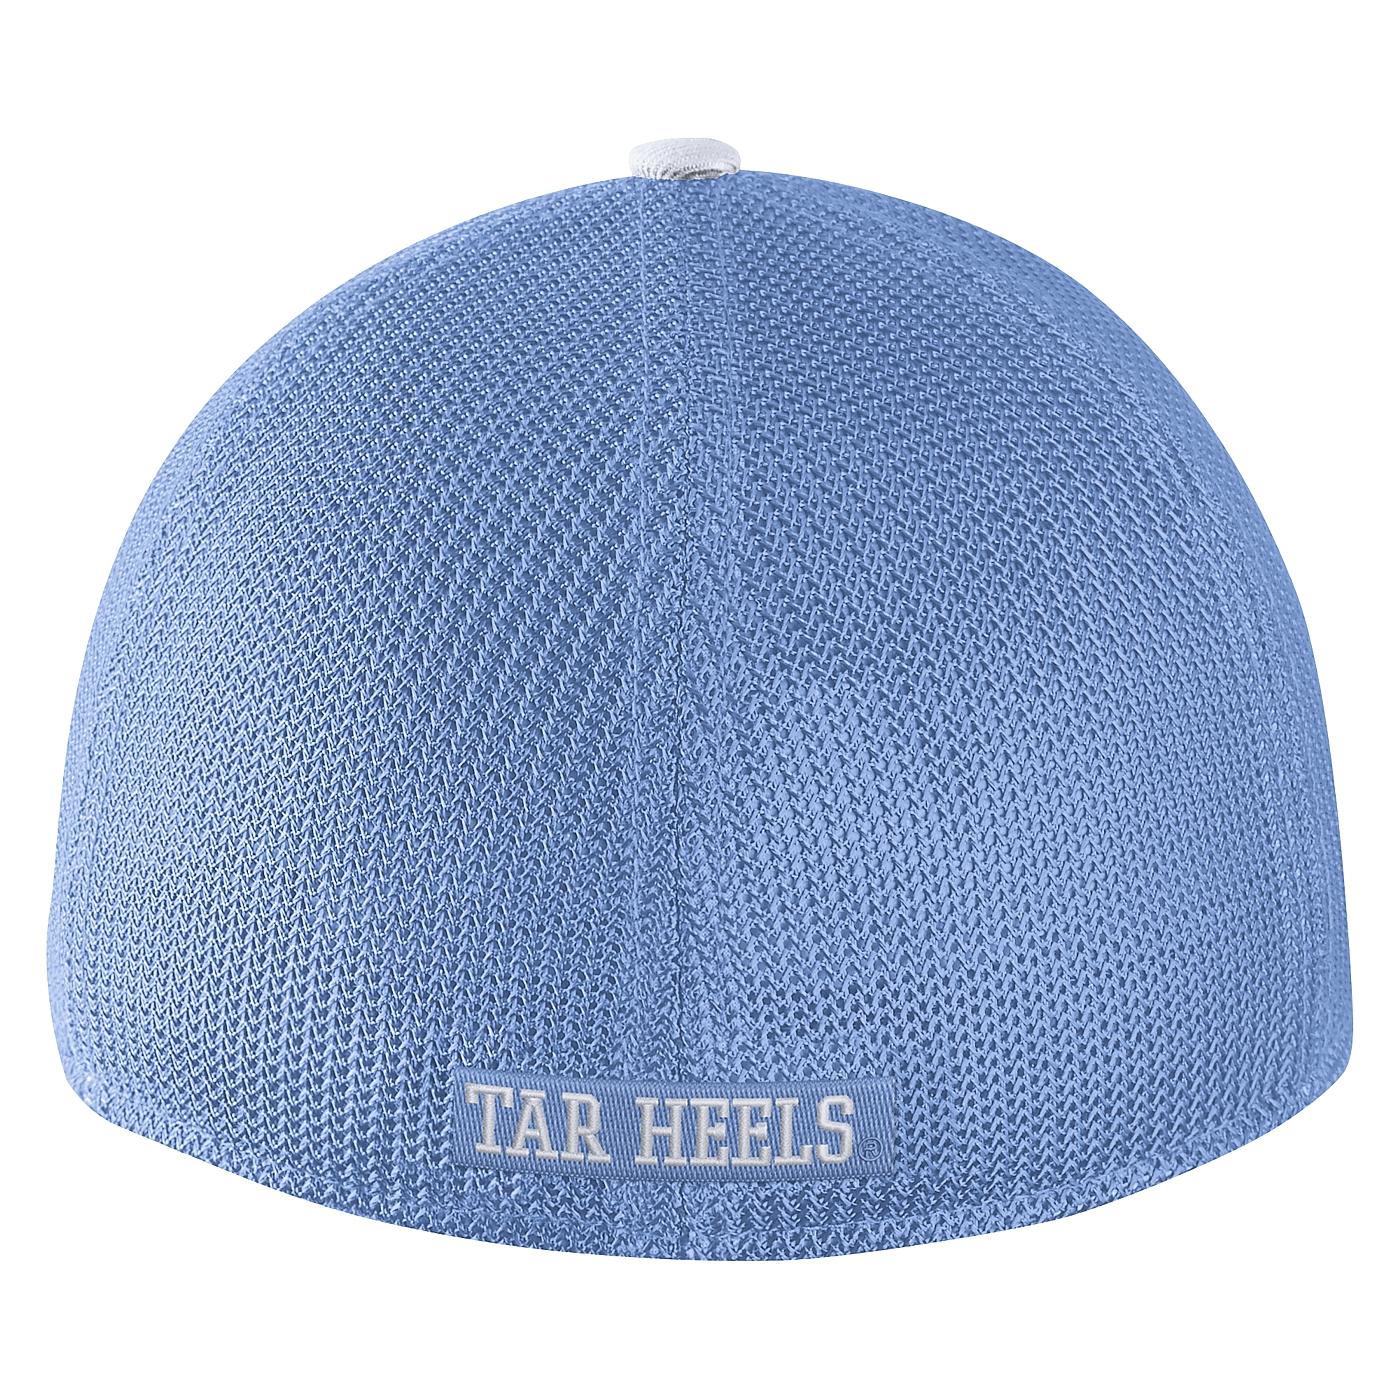 Johnny T-shirt - North Carolina Tar Heels - Nike Ram Head Aerobill  Classic99 Mesh Swoosh Flex Hat (CB) by Nike 93f4cad06a24